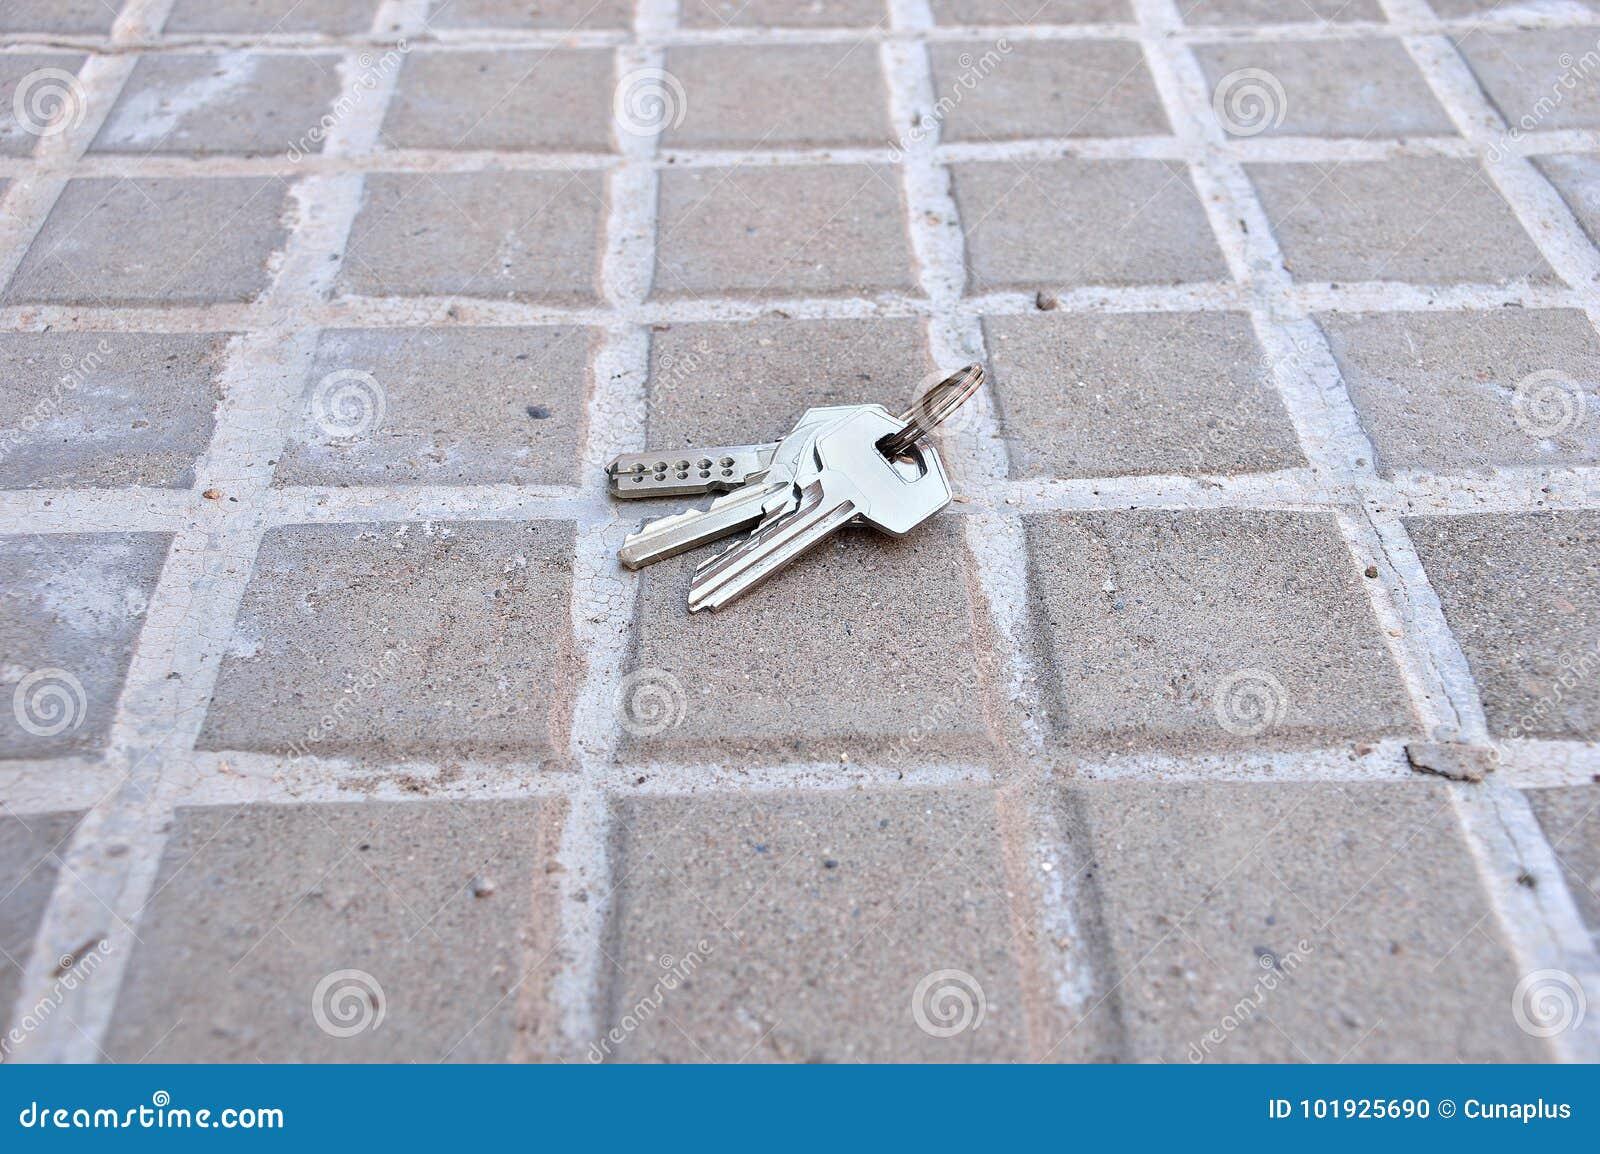 Lost keys of home